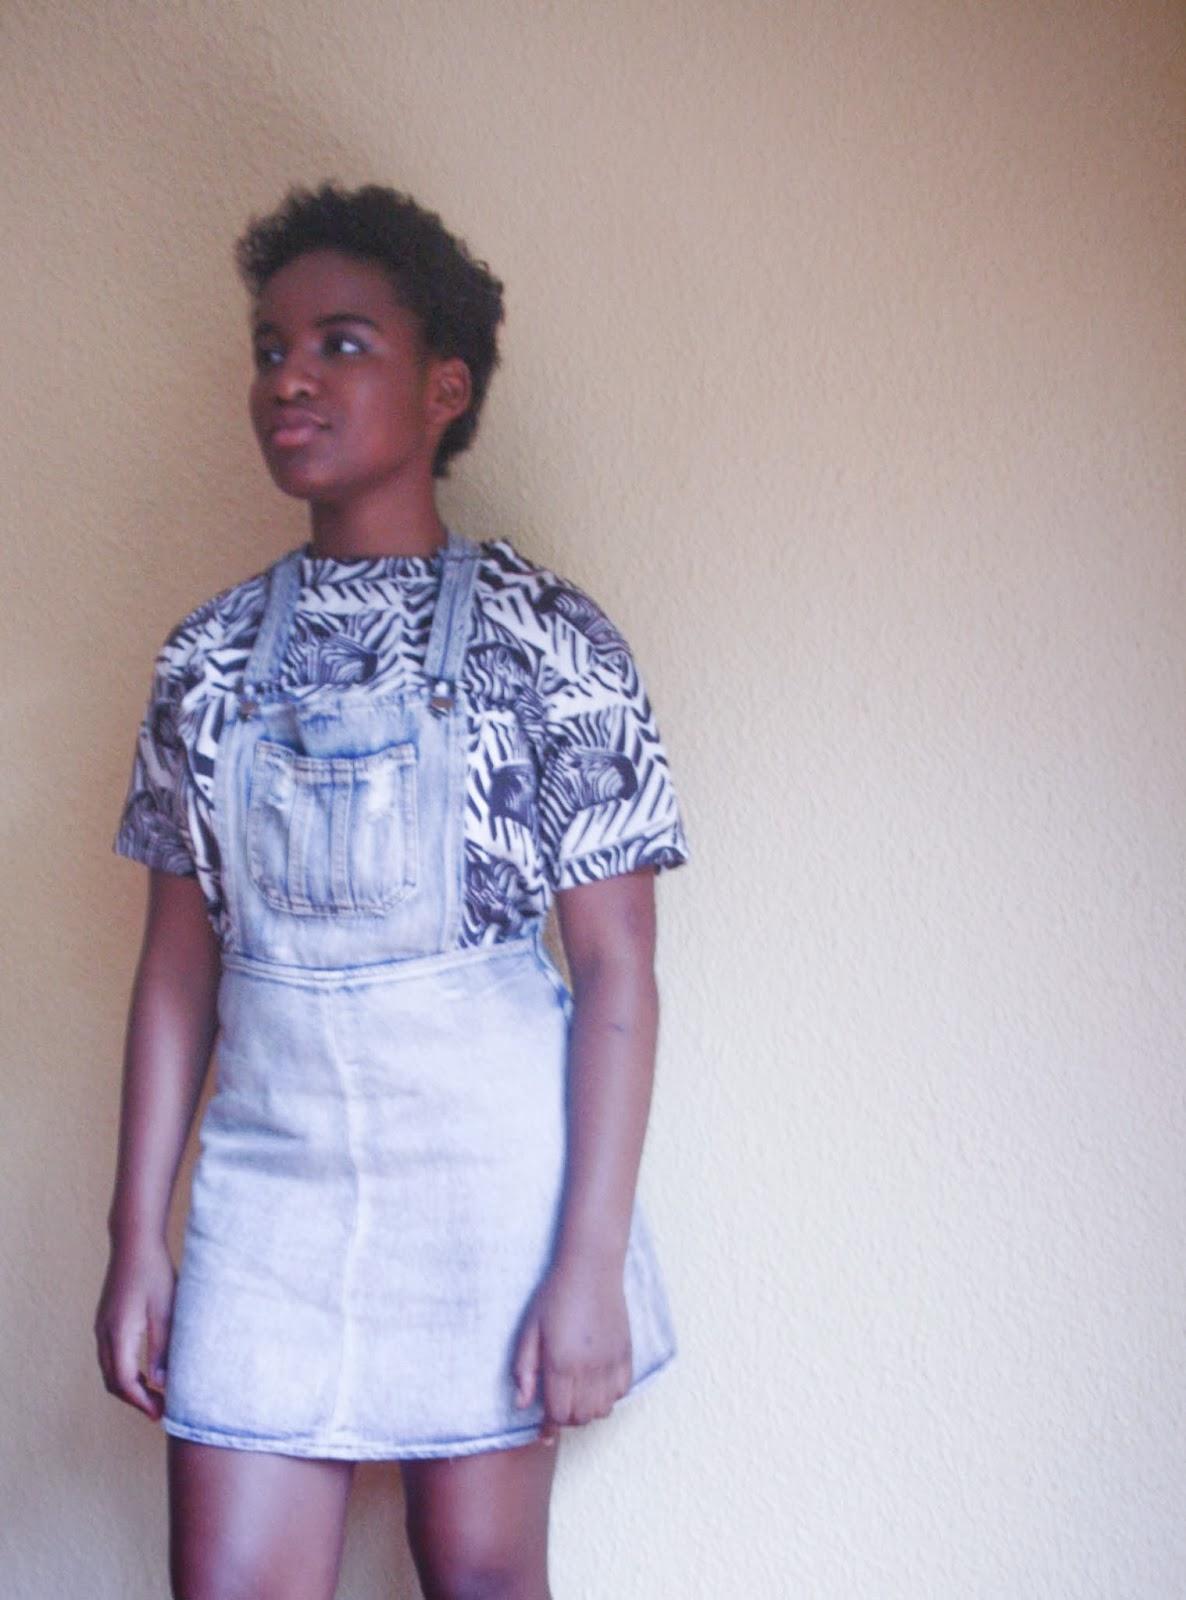 hipster black girl denim pinafore zebra print top